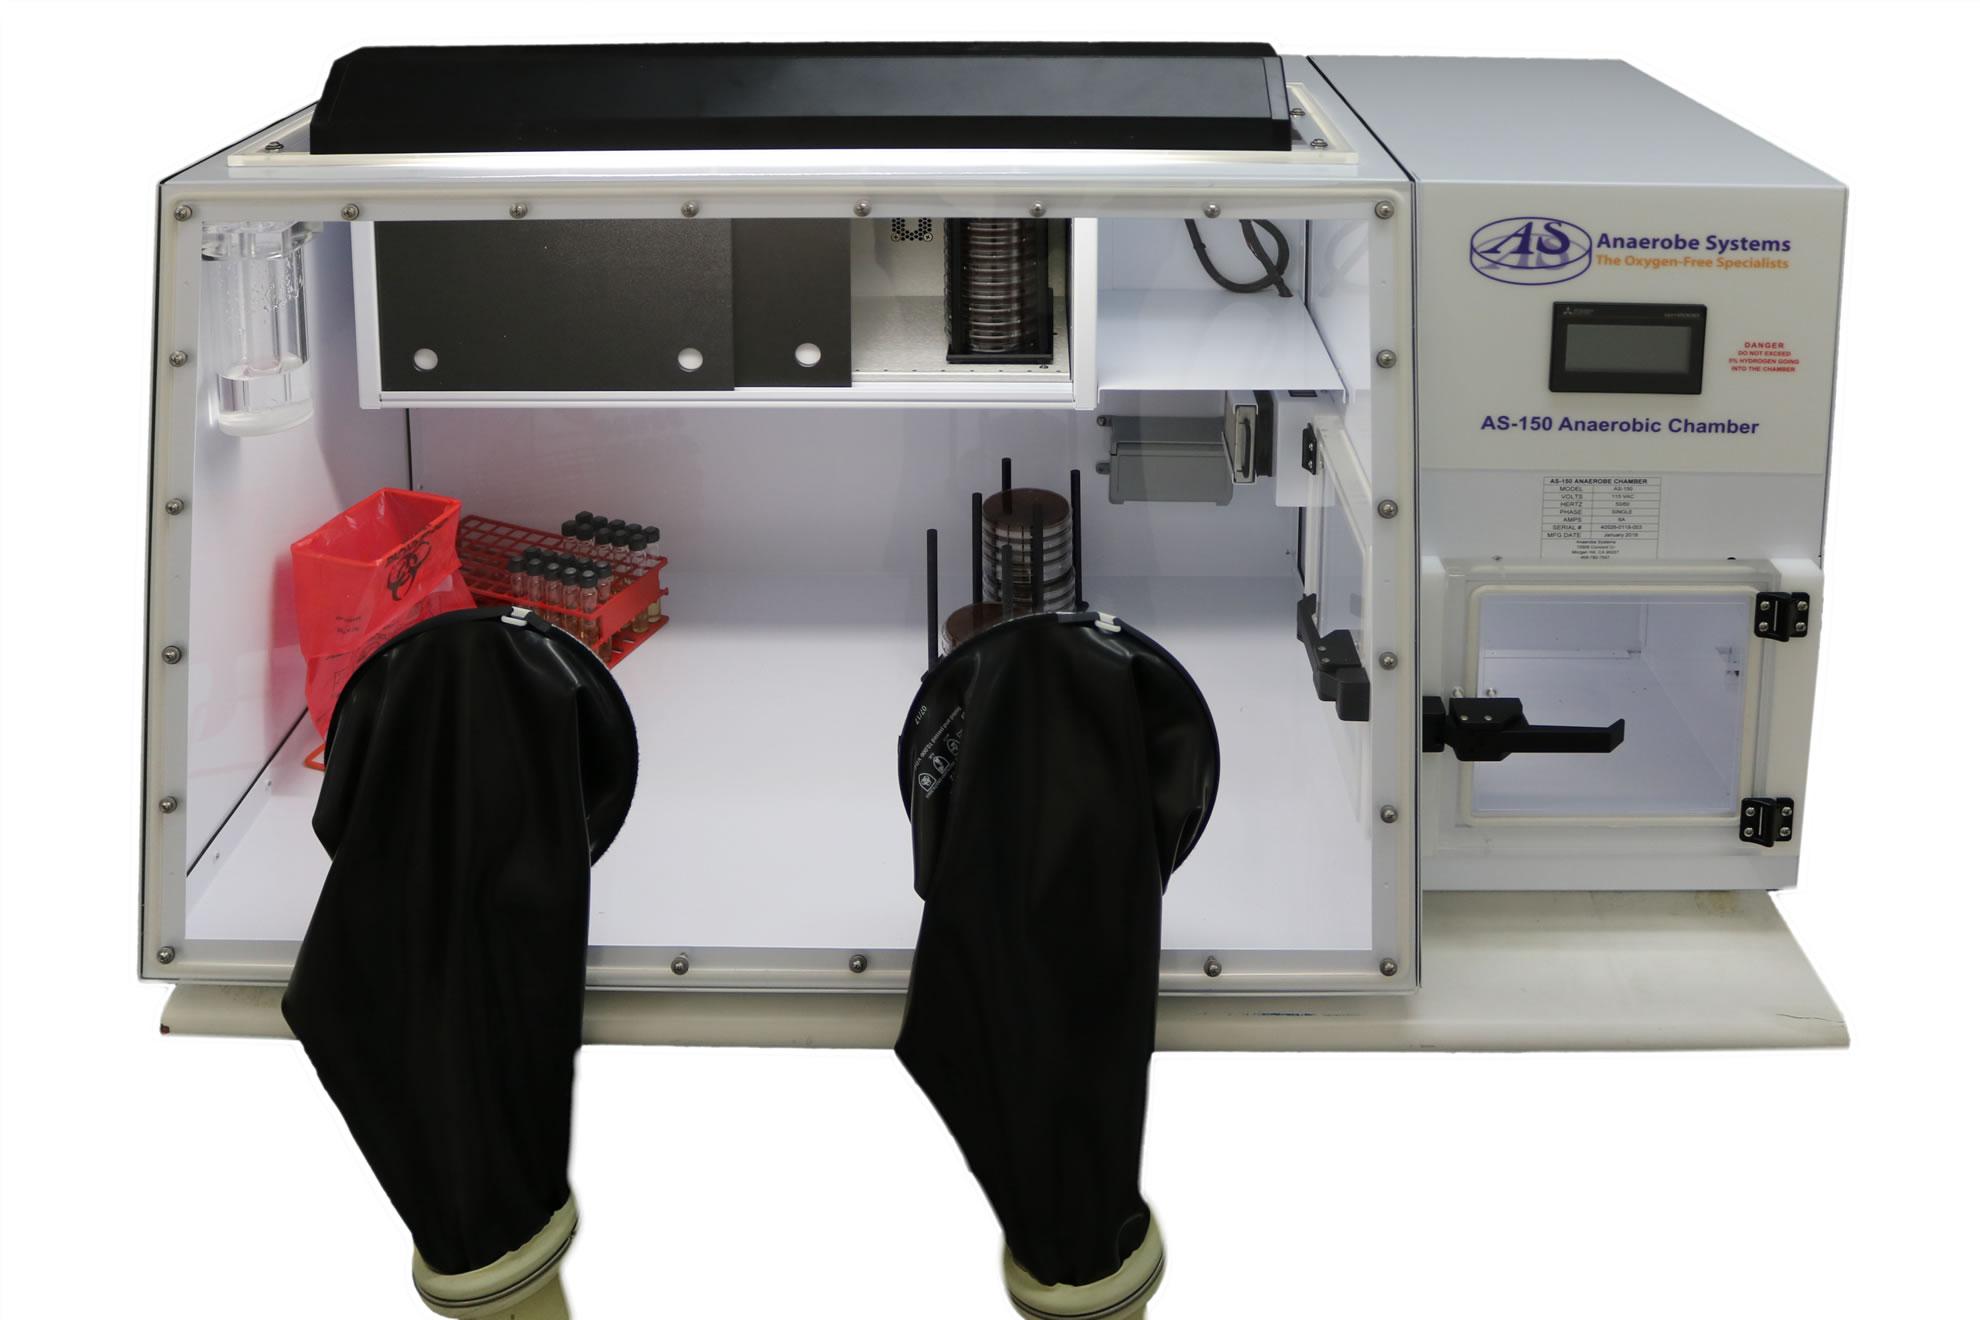 IMG_0098 edited 1 anaerobic chambers anaerobe systems